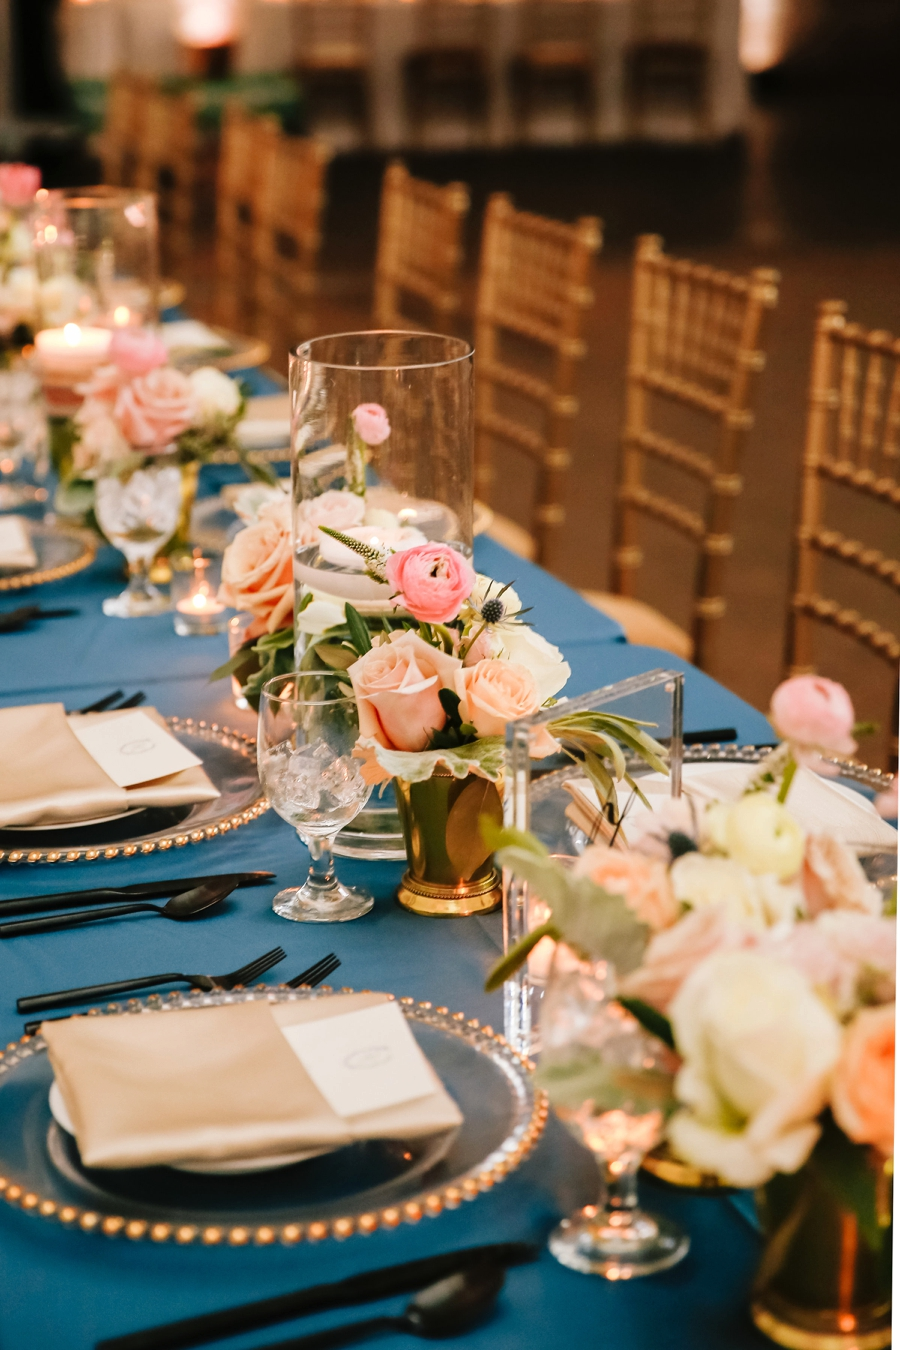 A Romantic Blush & Blue Tampa Wedding via TheELD.com A Romantic Blush & Blue Tampa Wedding - A Romantic Blush Blue Tampa Wedding 0035 - A Romantic Blush & Blue Tampa Wedding